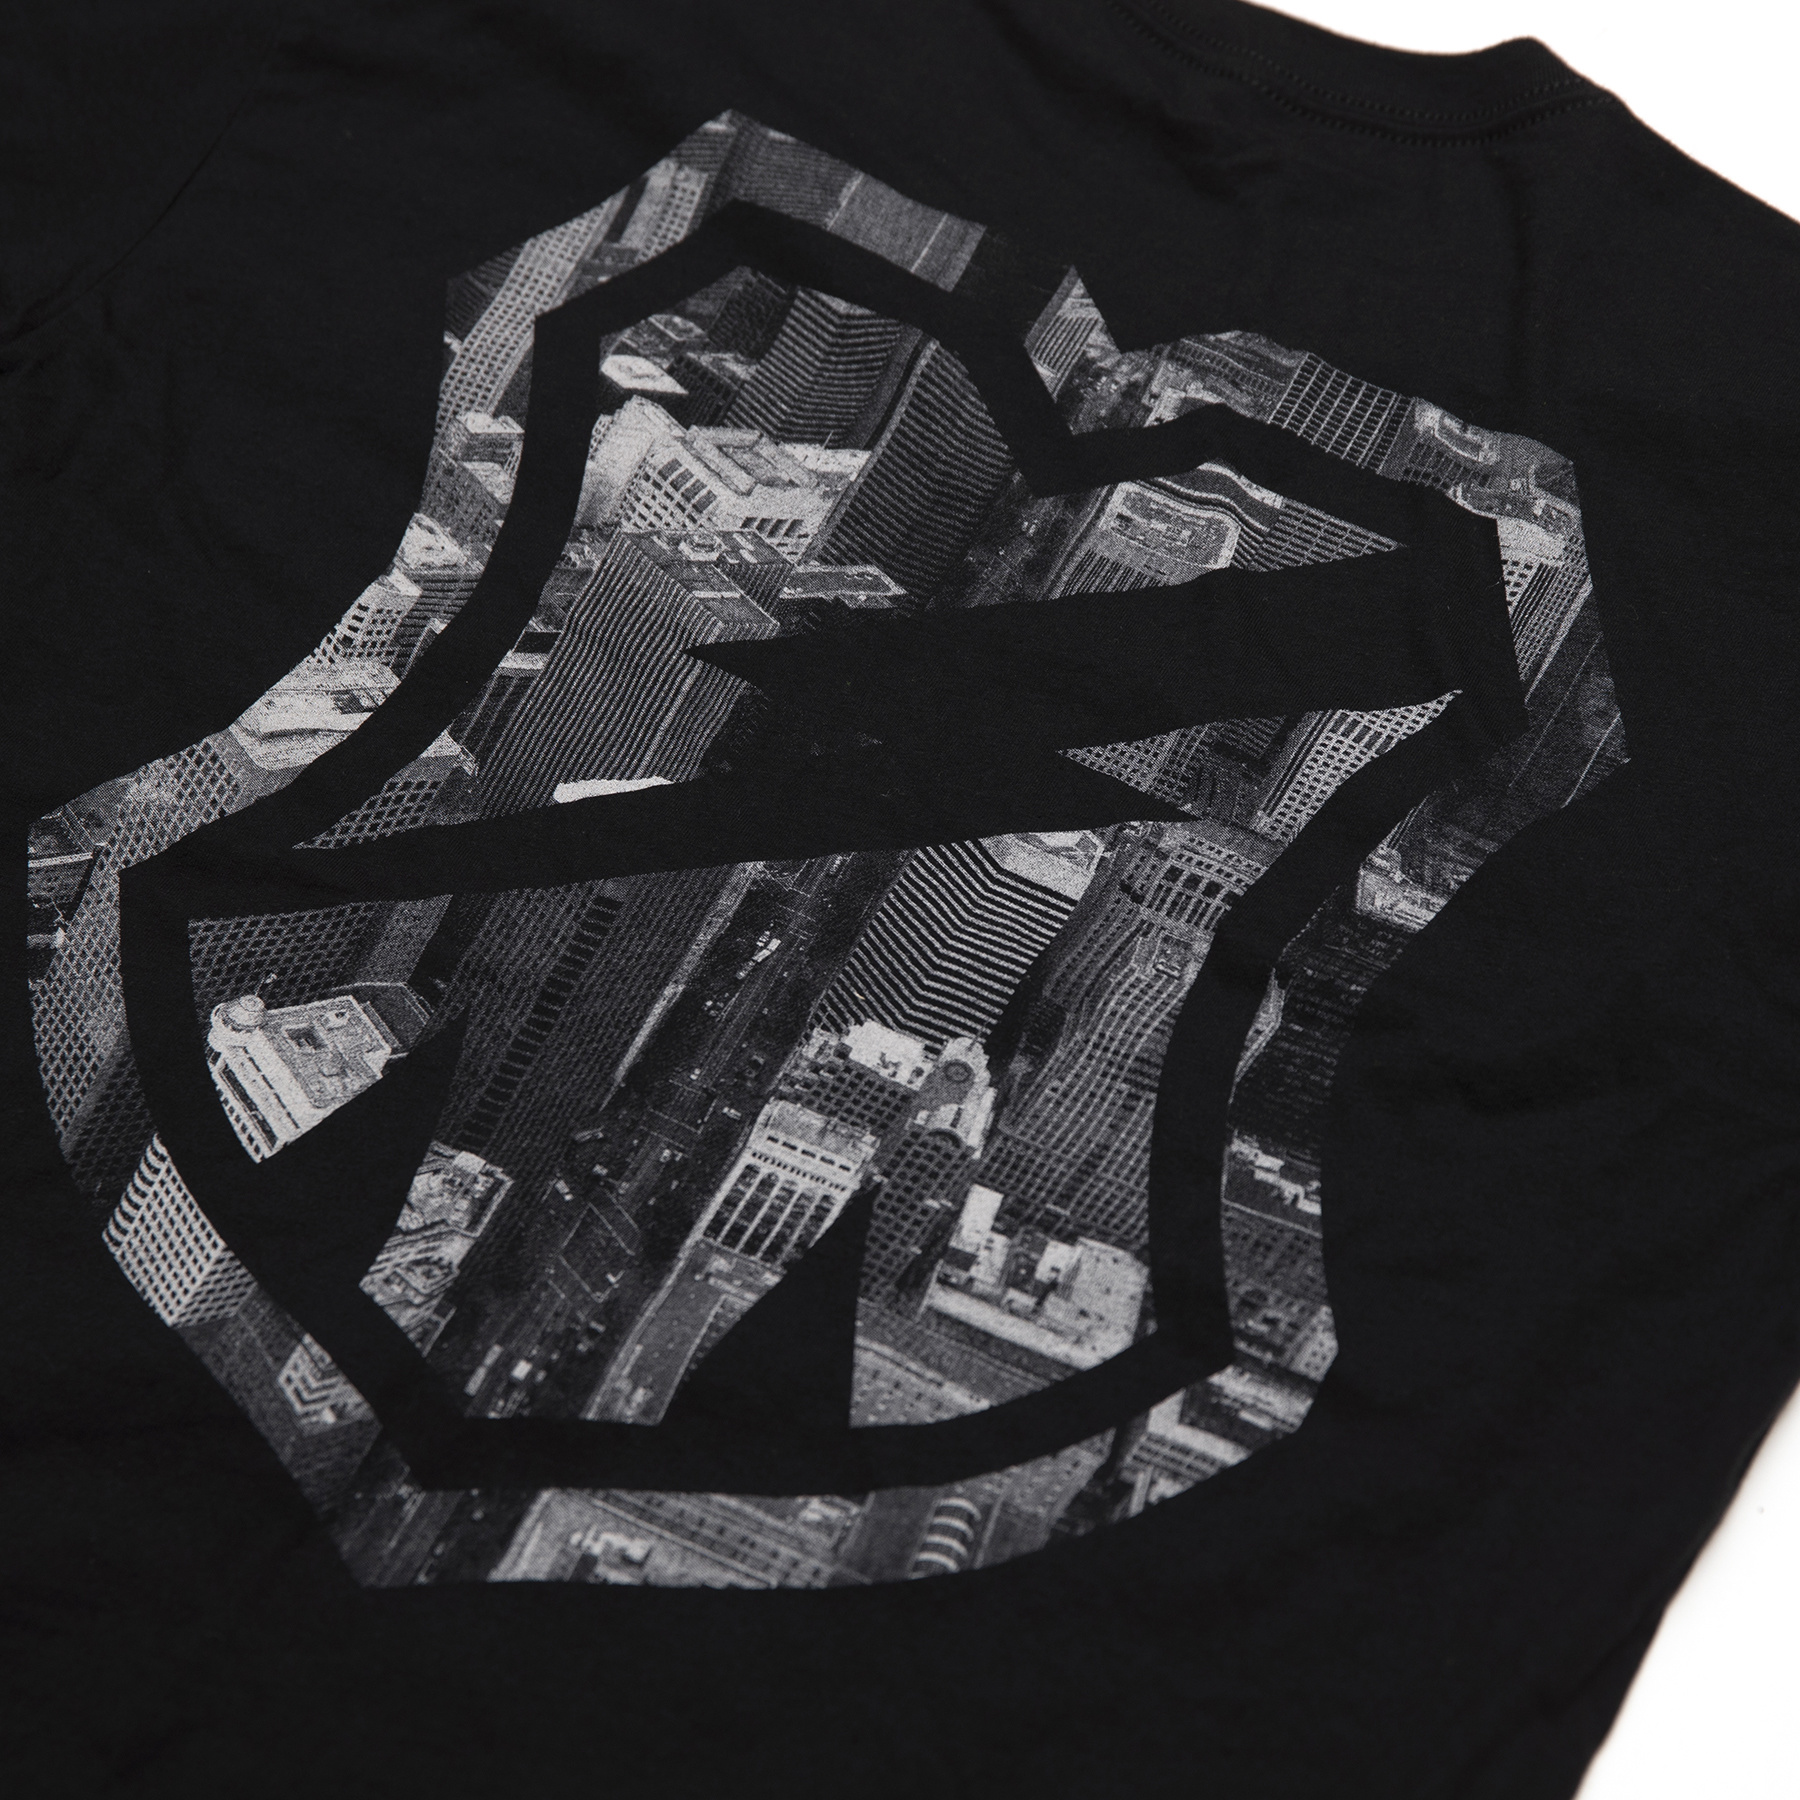 MASH Death Cities T-Shirt Black